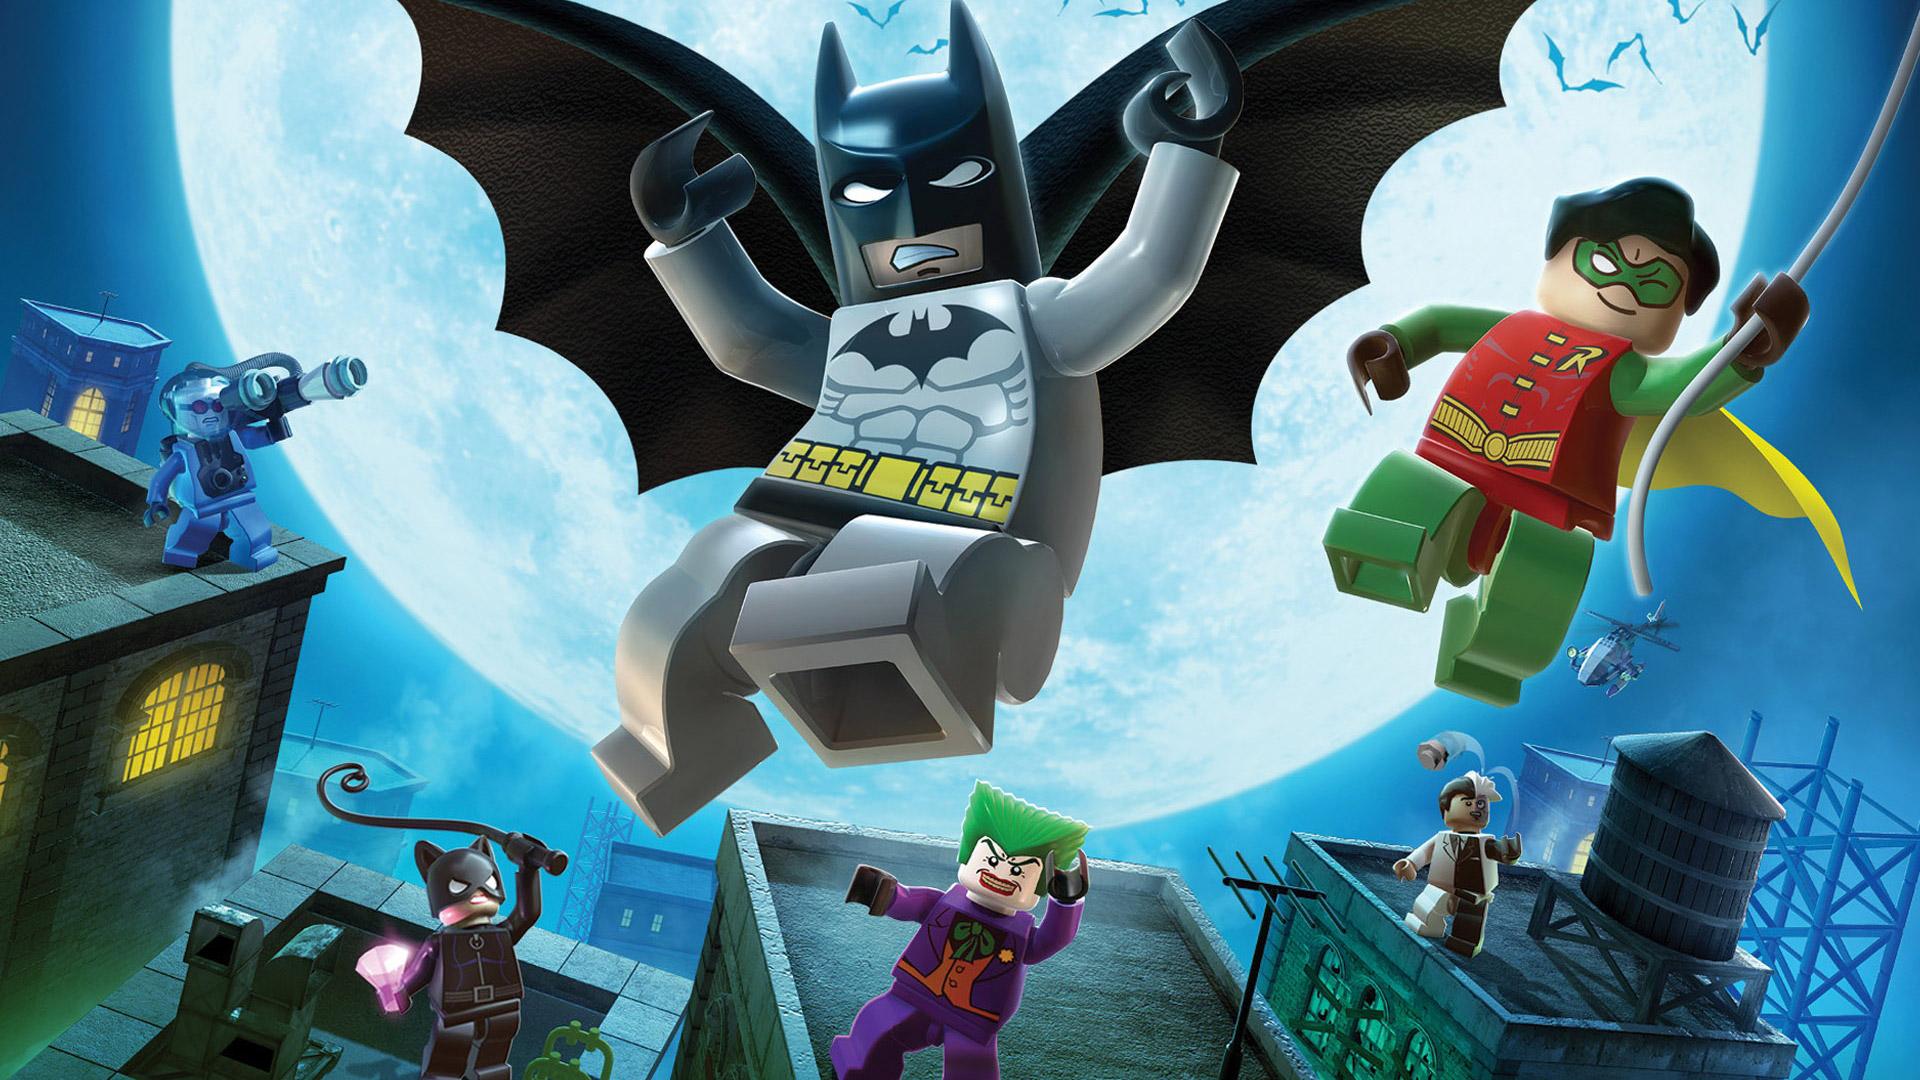 Lego Batman: The Videogame Wallpaper in 1920x1080